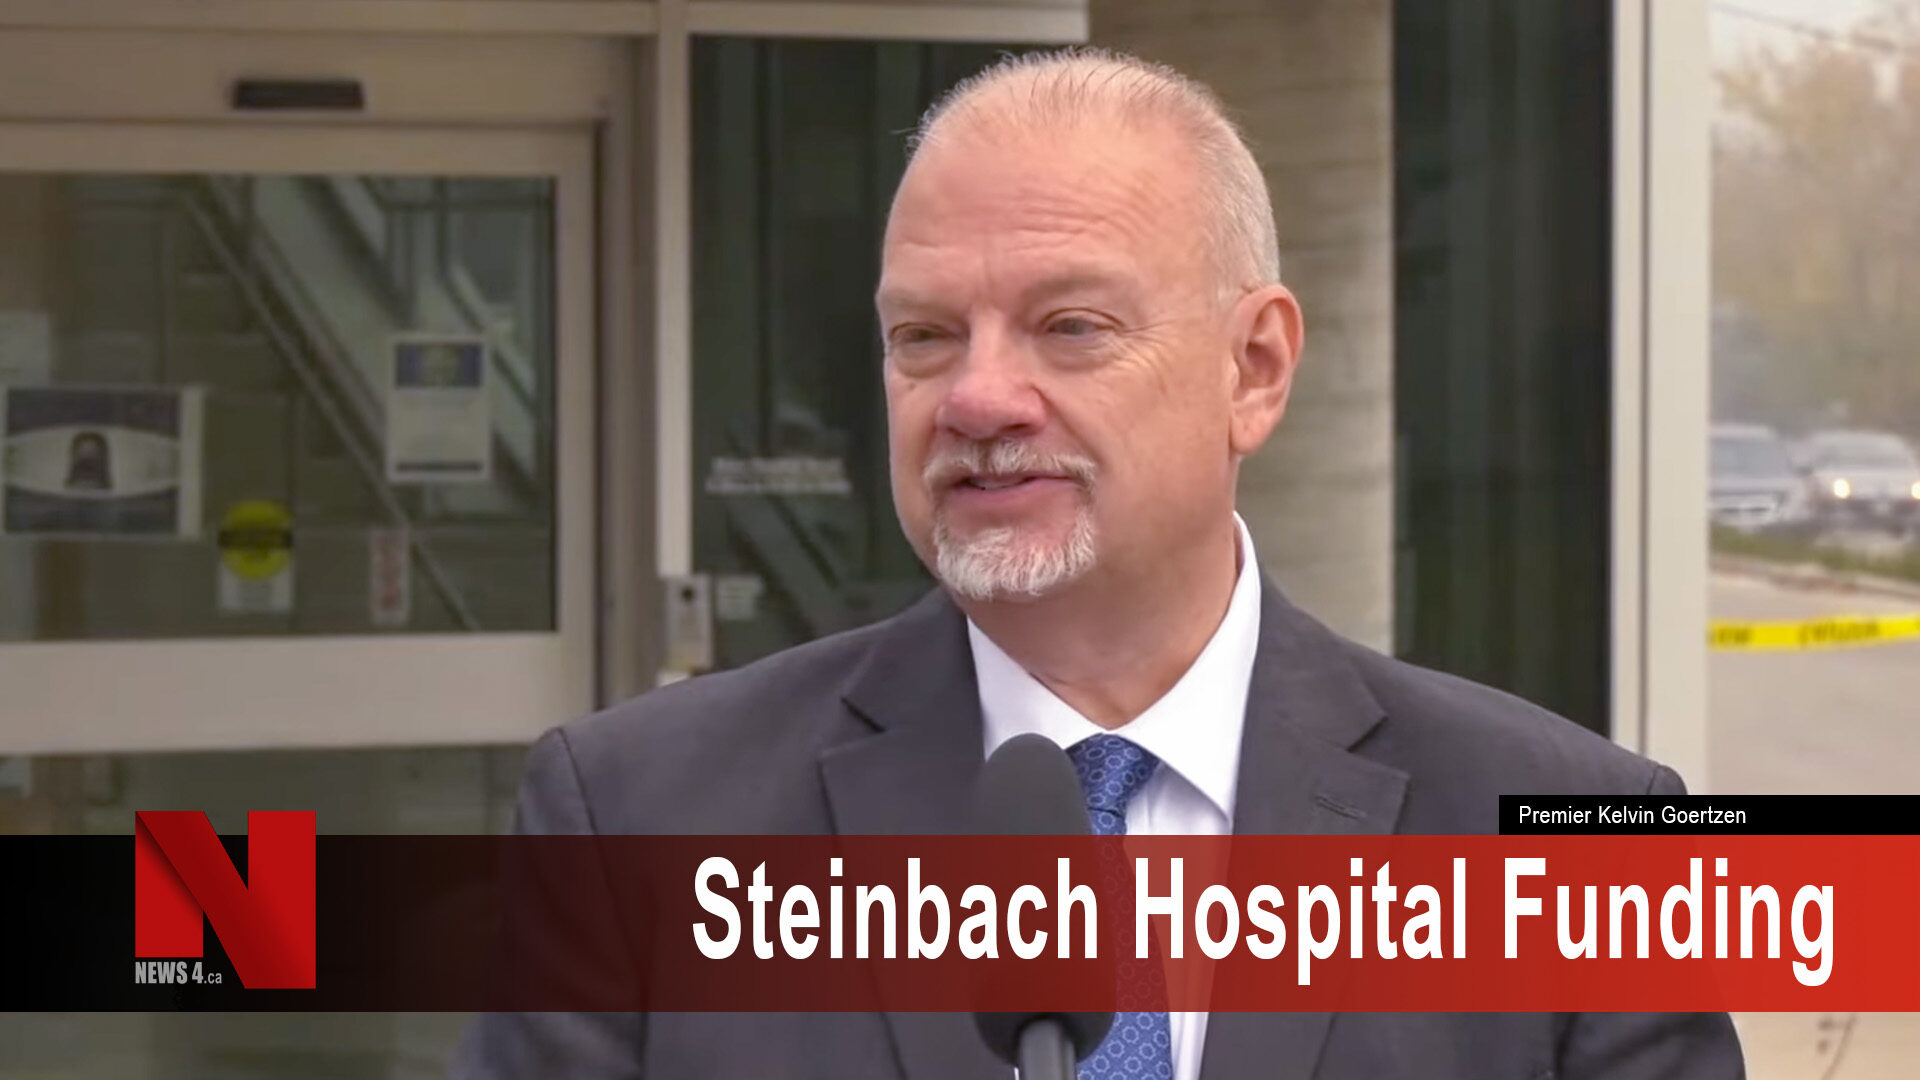 Steinbach Hospital Funding